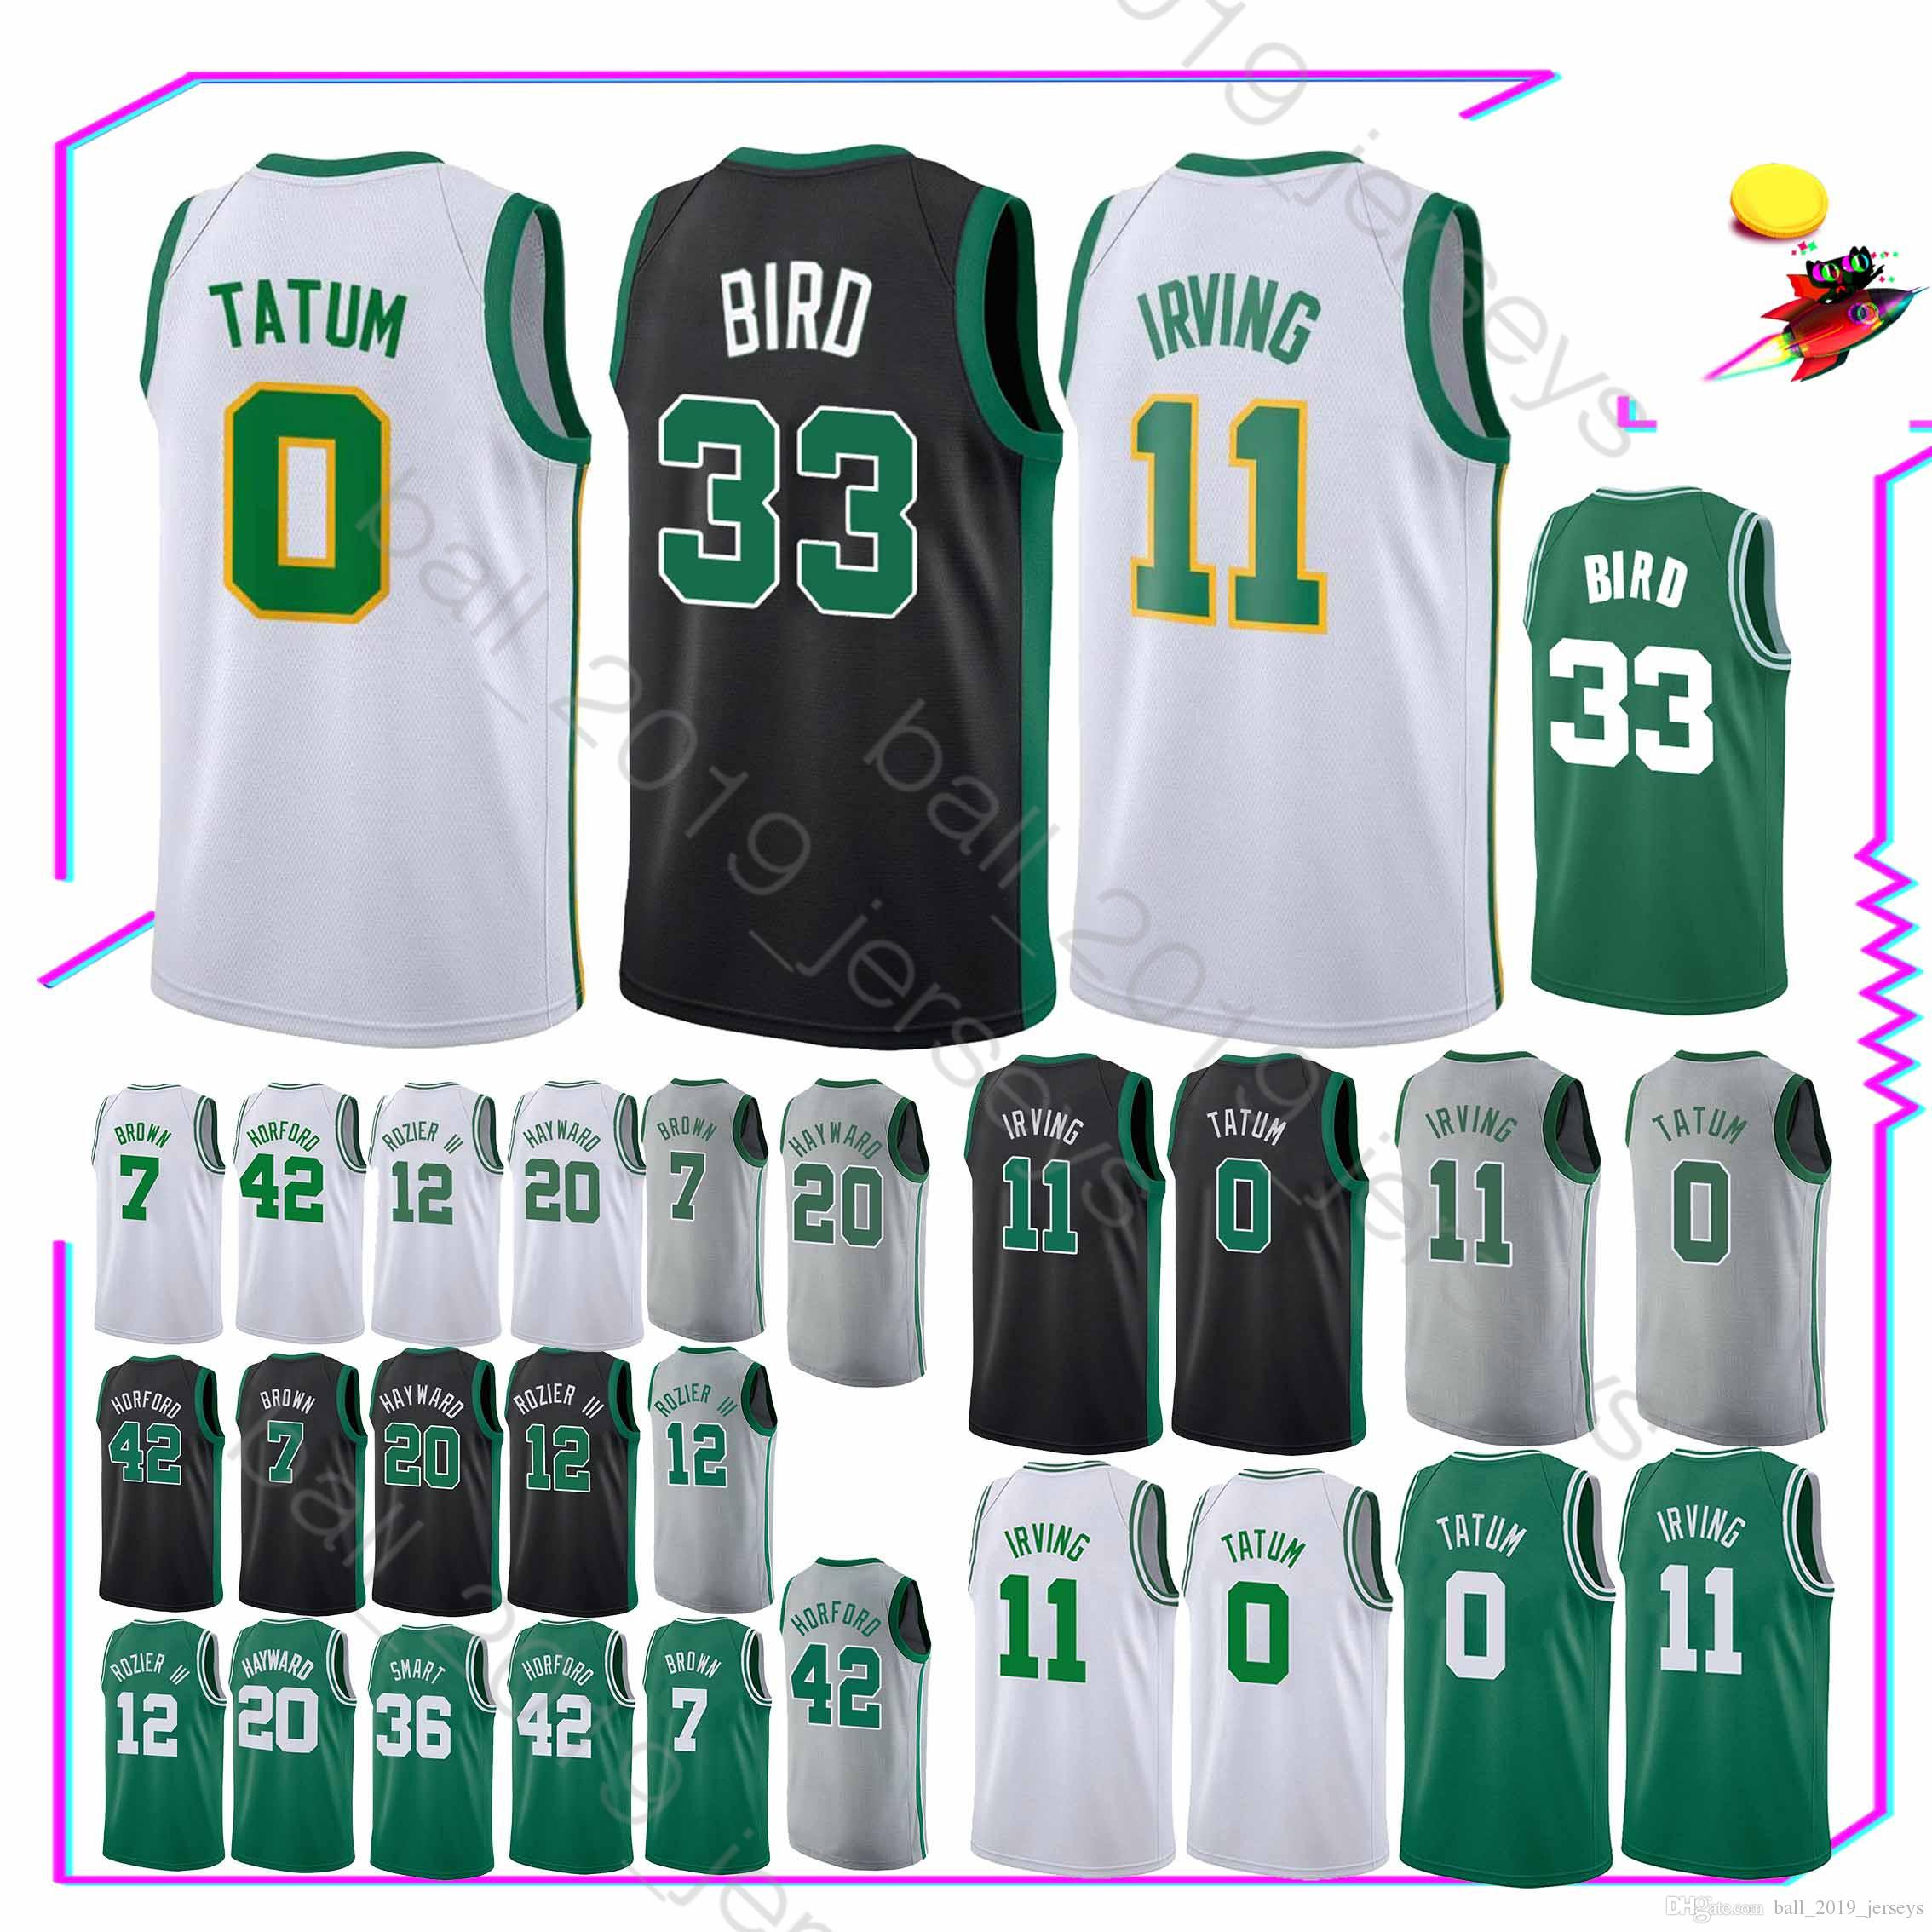 new styles 37859 3d693 Boston jerseys Celtic Jayson 0 Tatum jersey 11 Irving Larry 33 Bird Gordon  20 Hayward jerseys